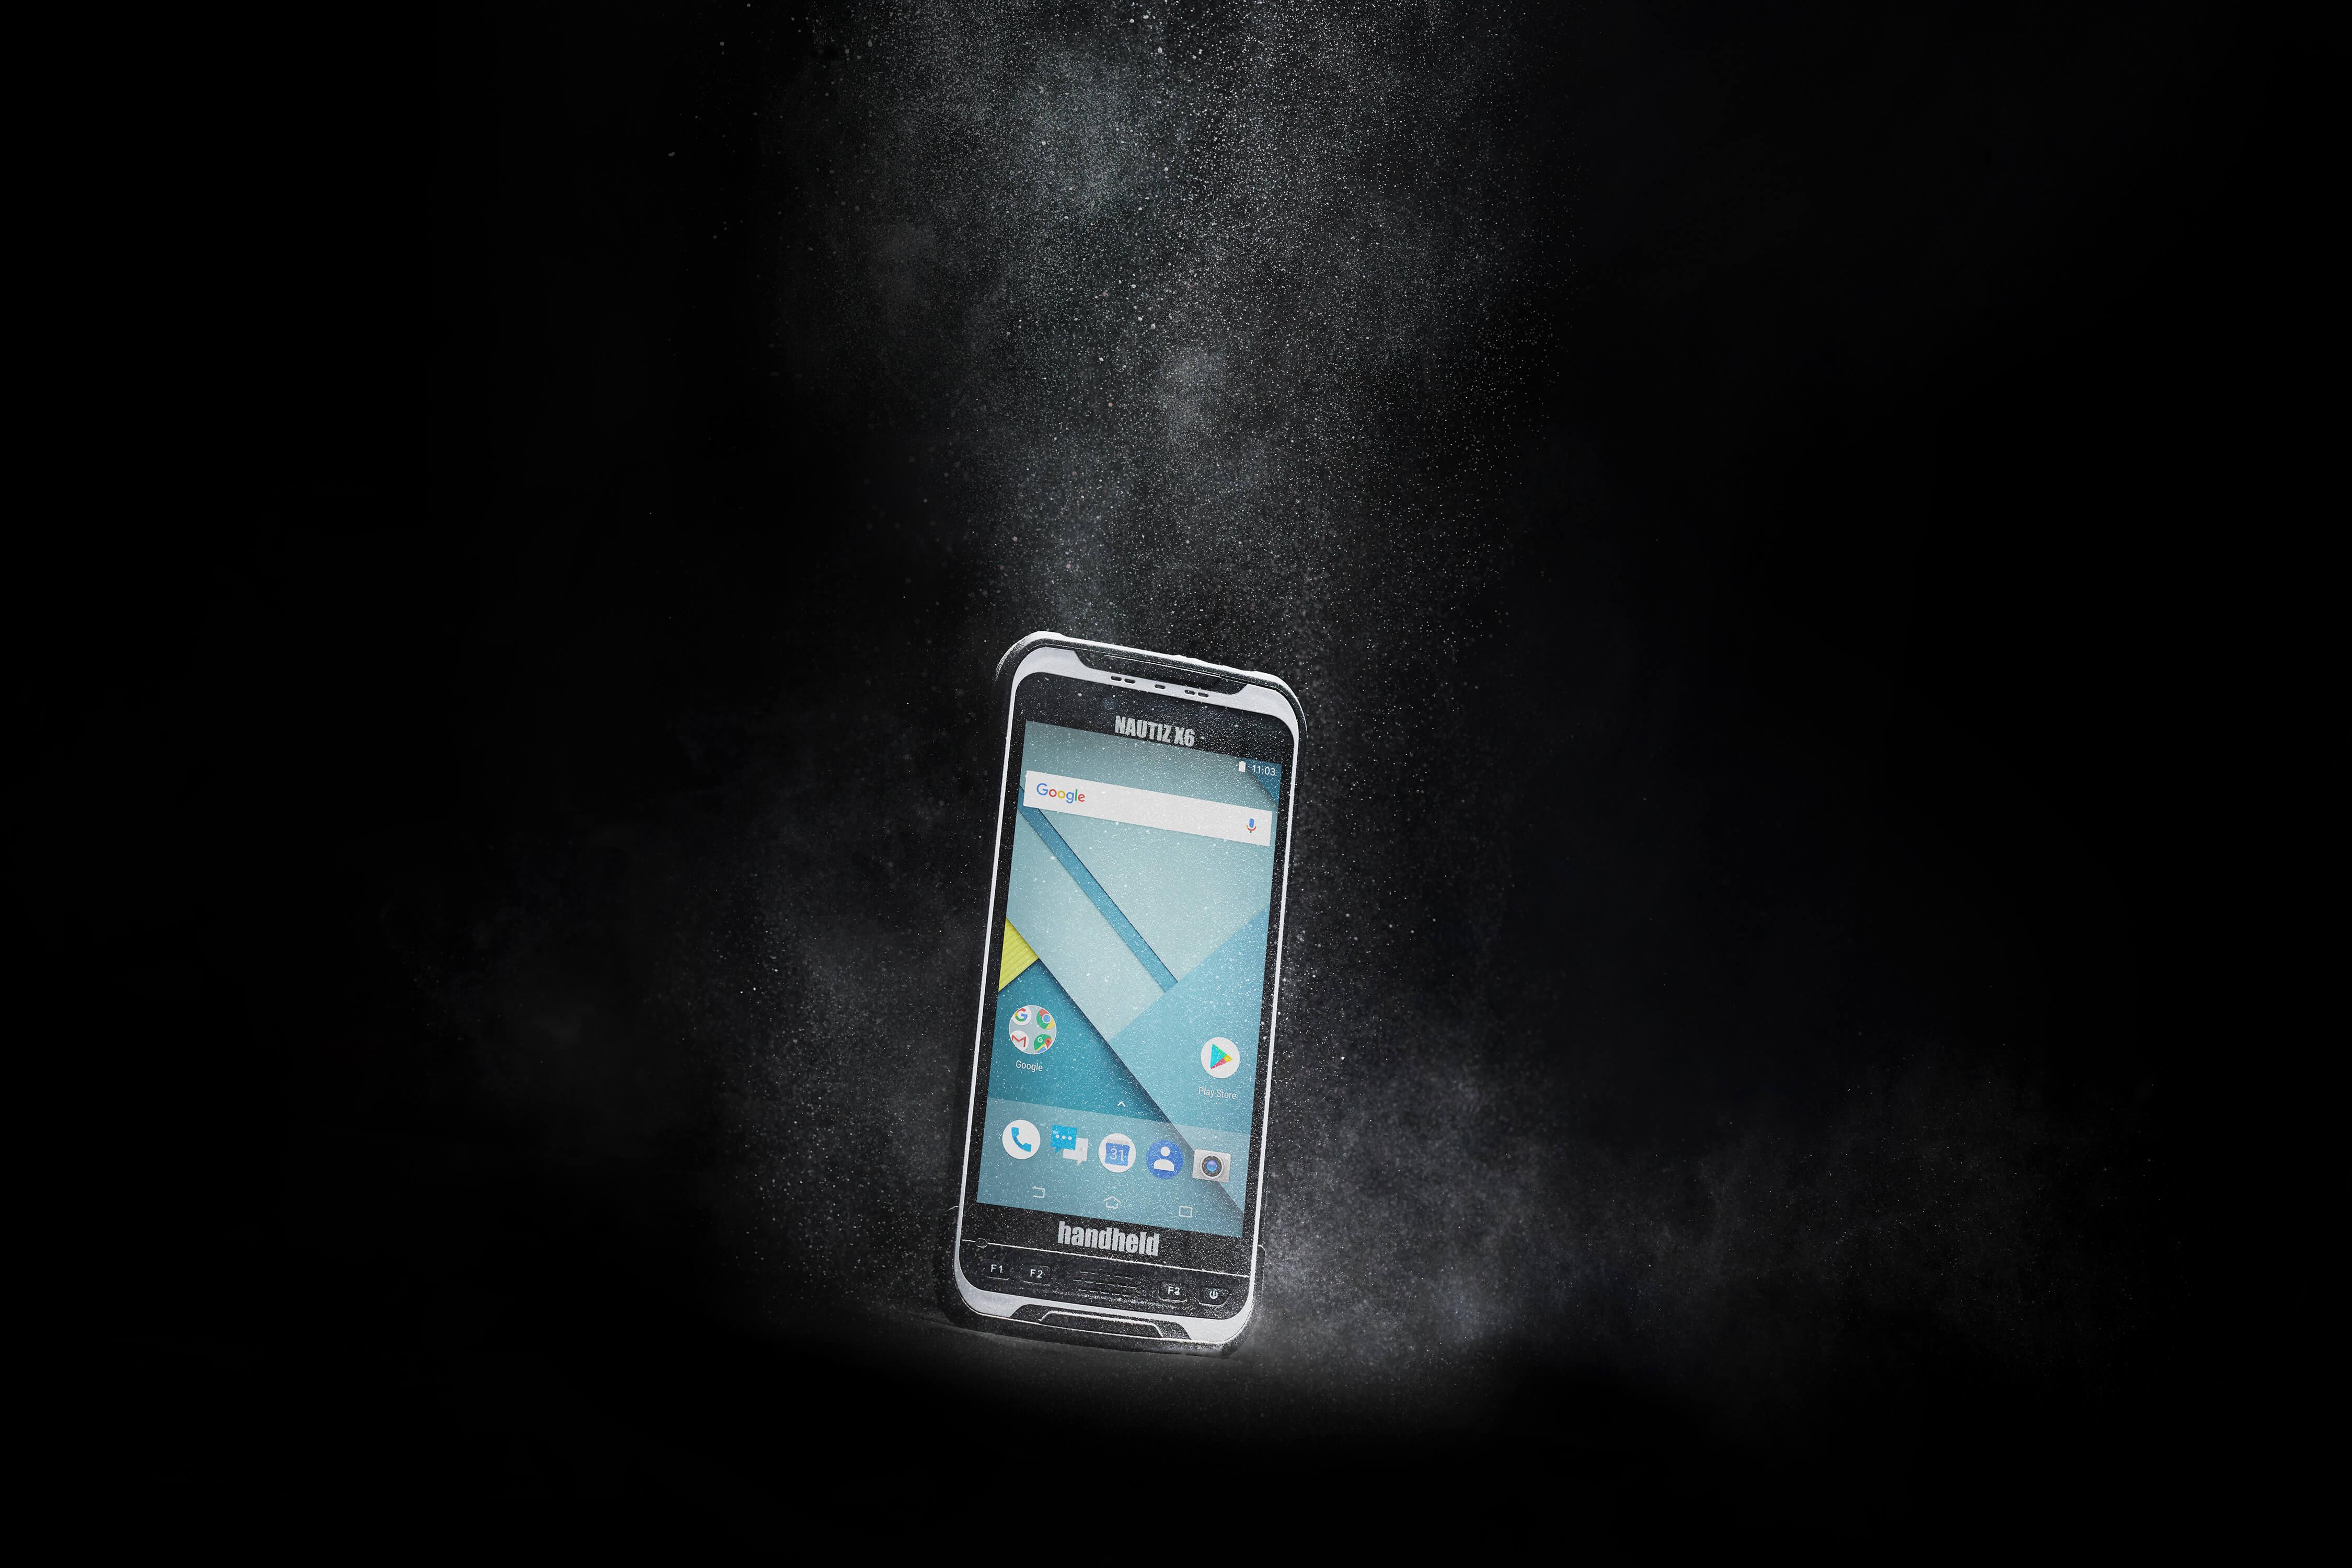 Nautiz-X6-Adroid-phablet-handheld-dust